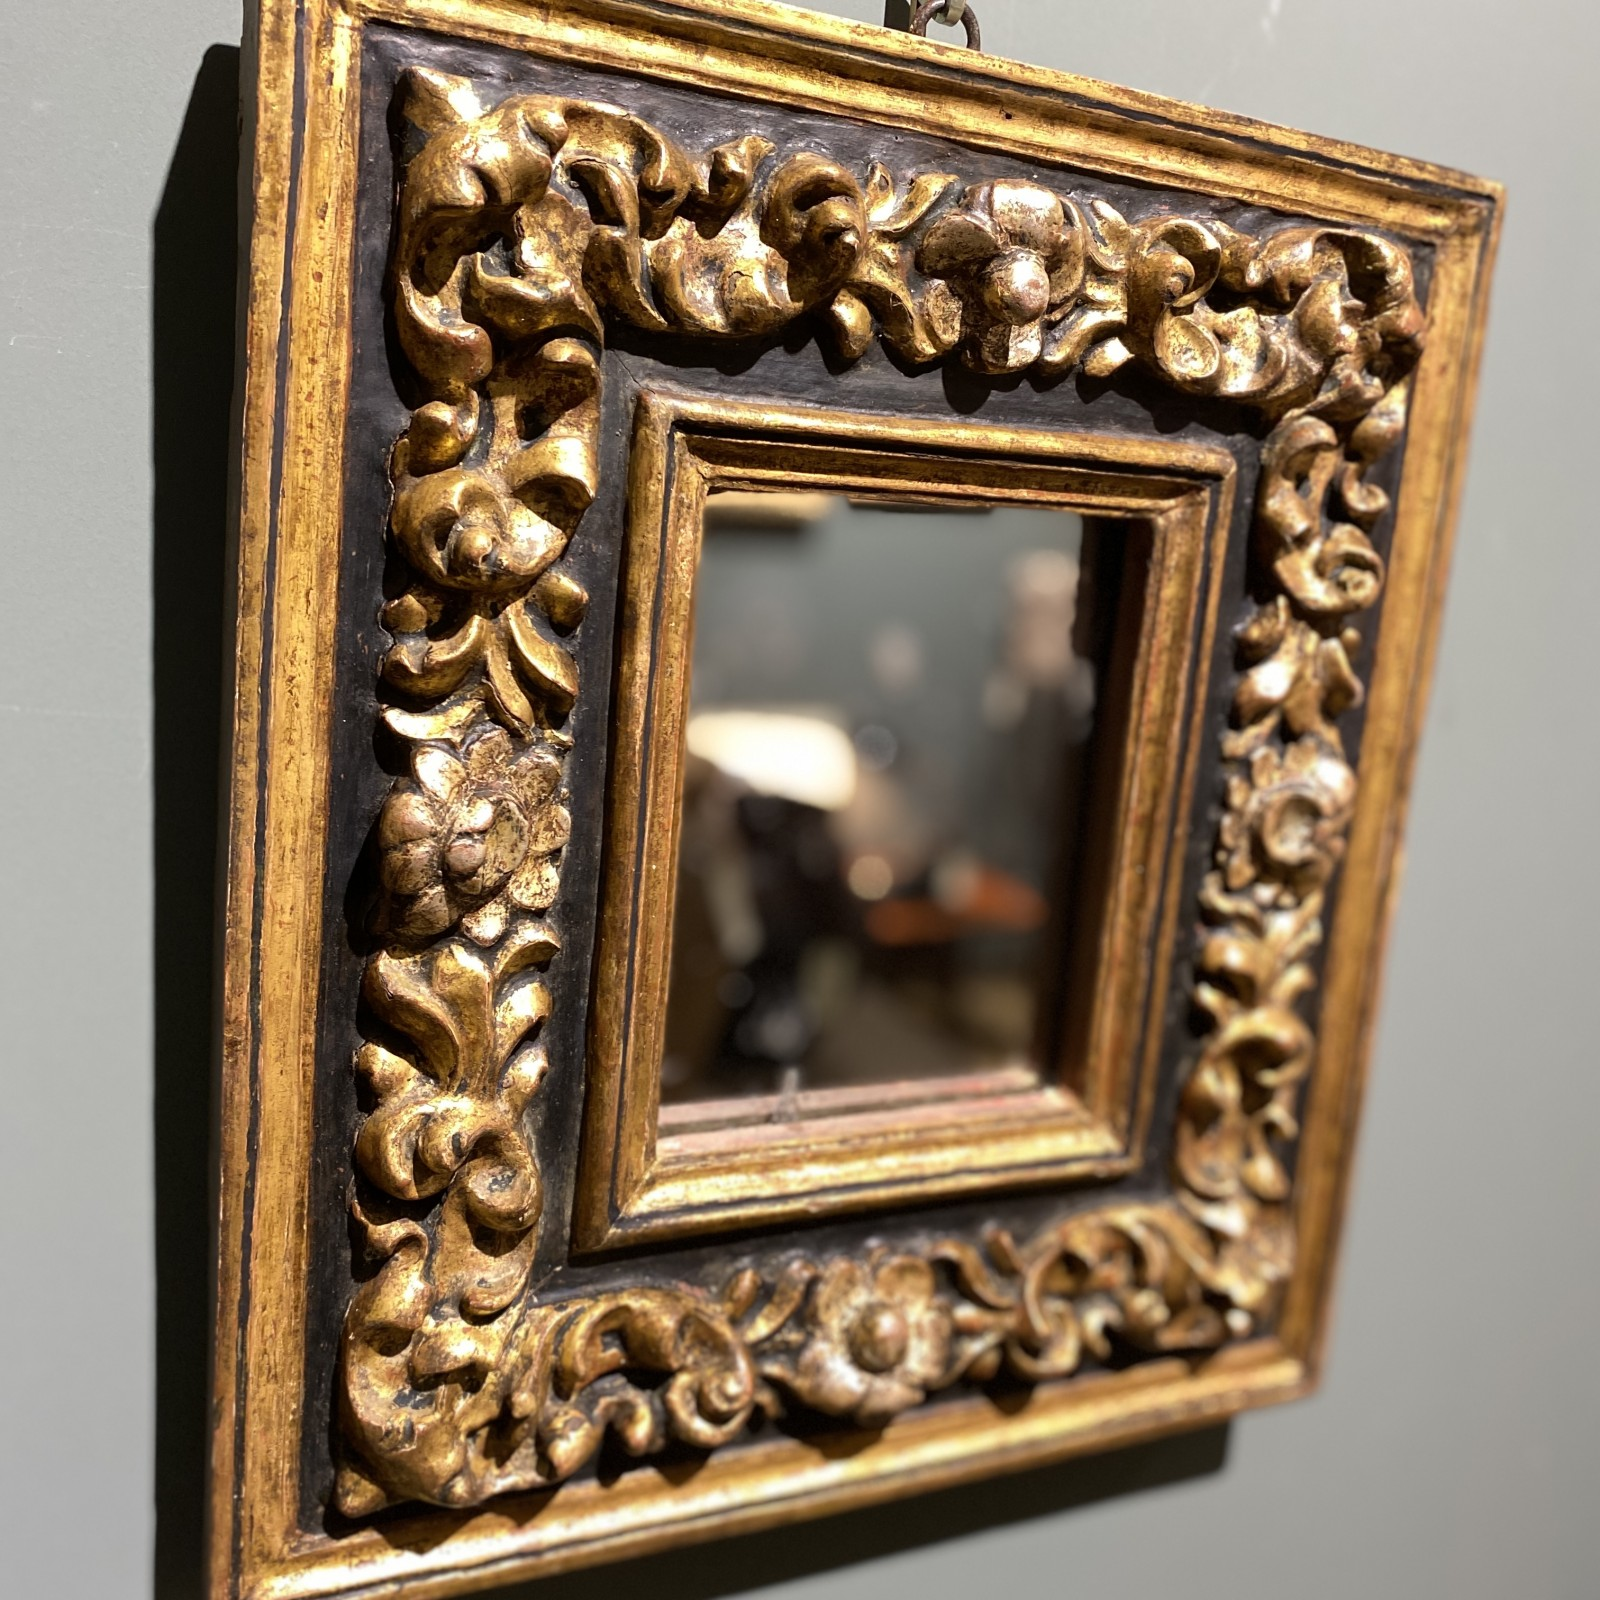 17th century Spanish mirror